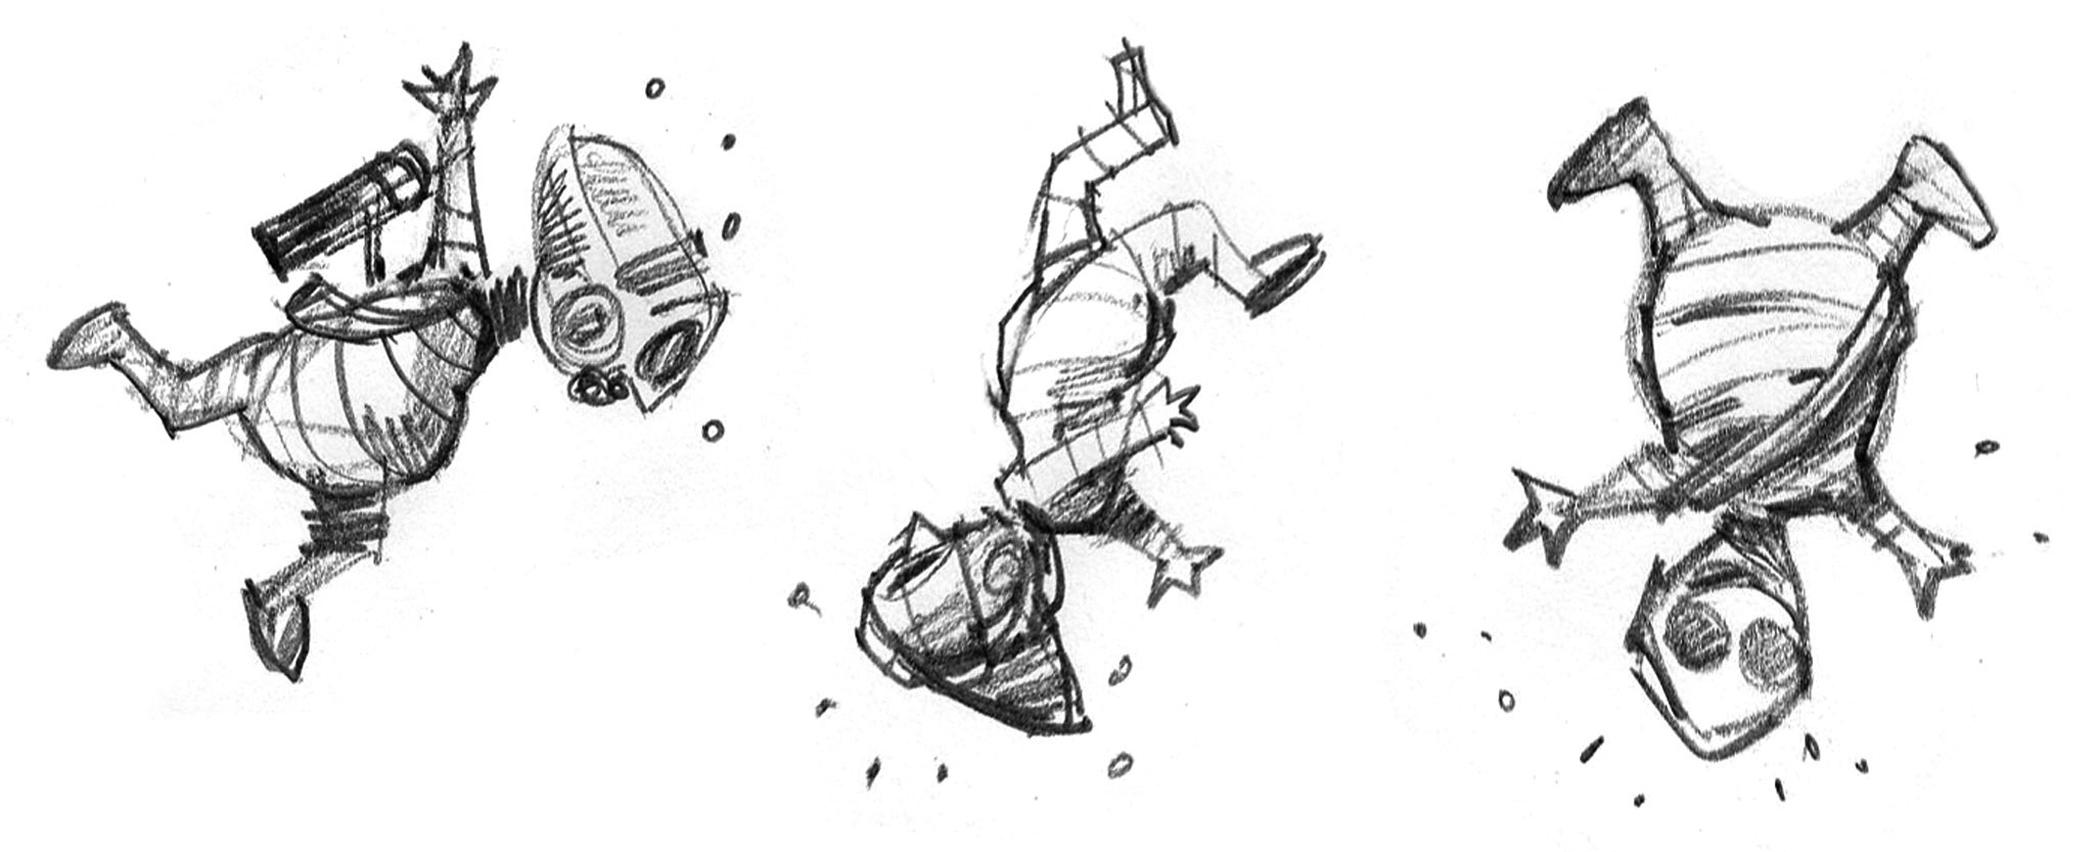 Teedo studies. He was the most fun to illustrate, with his beer gut. Grog gut?